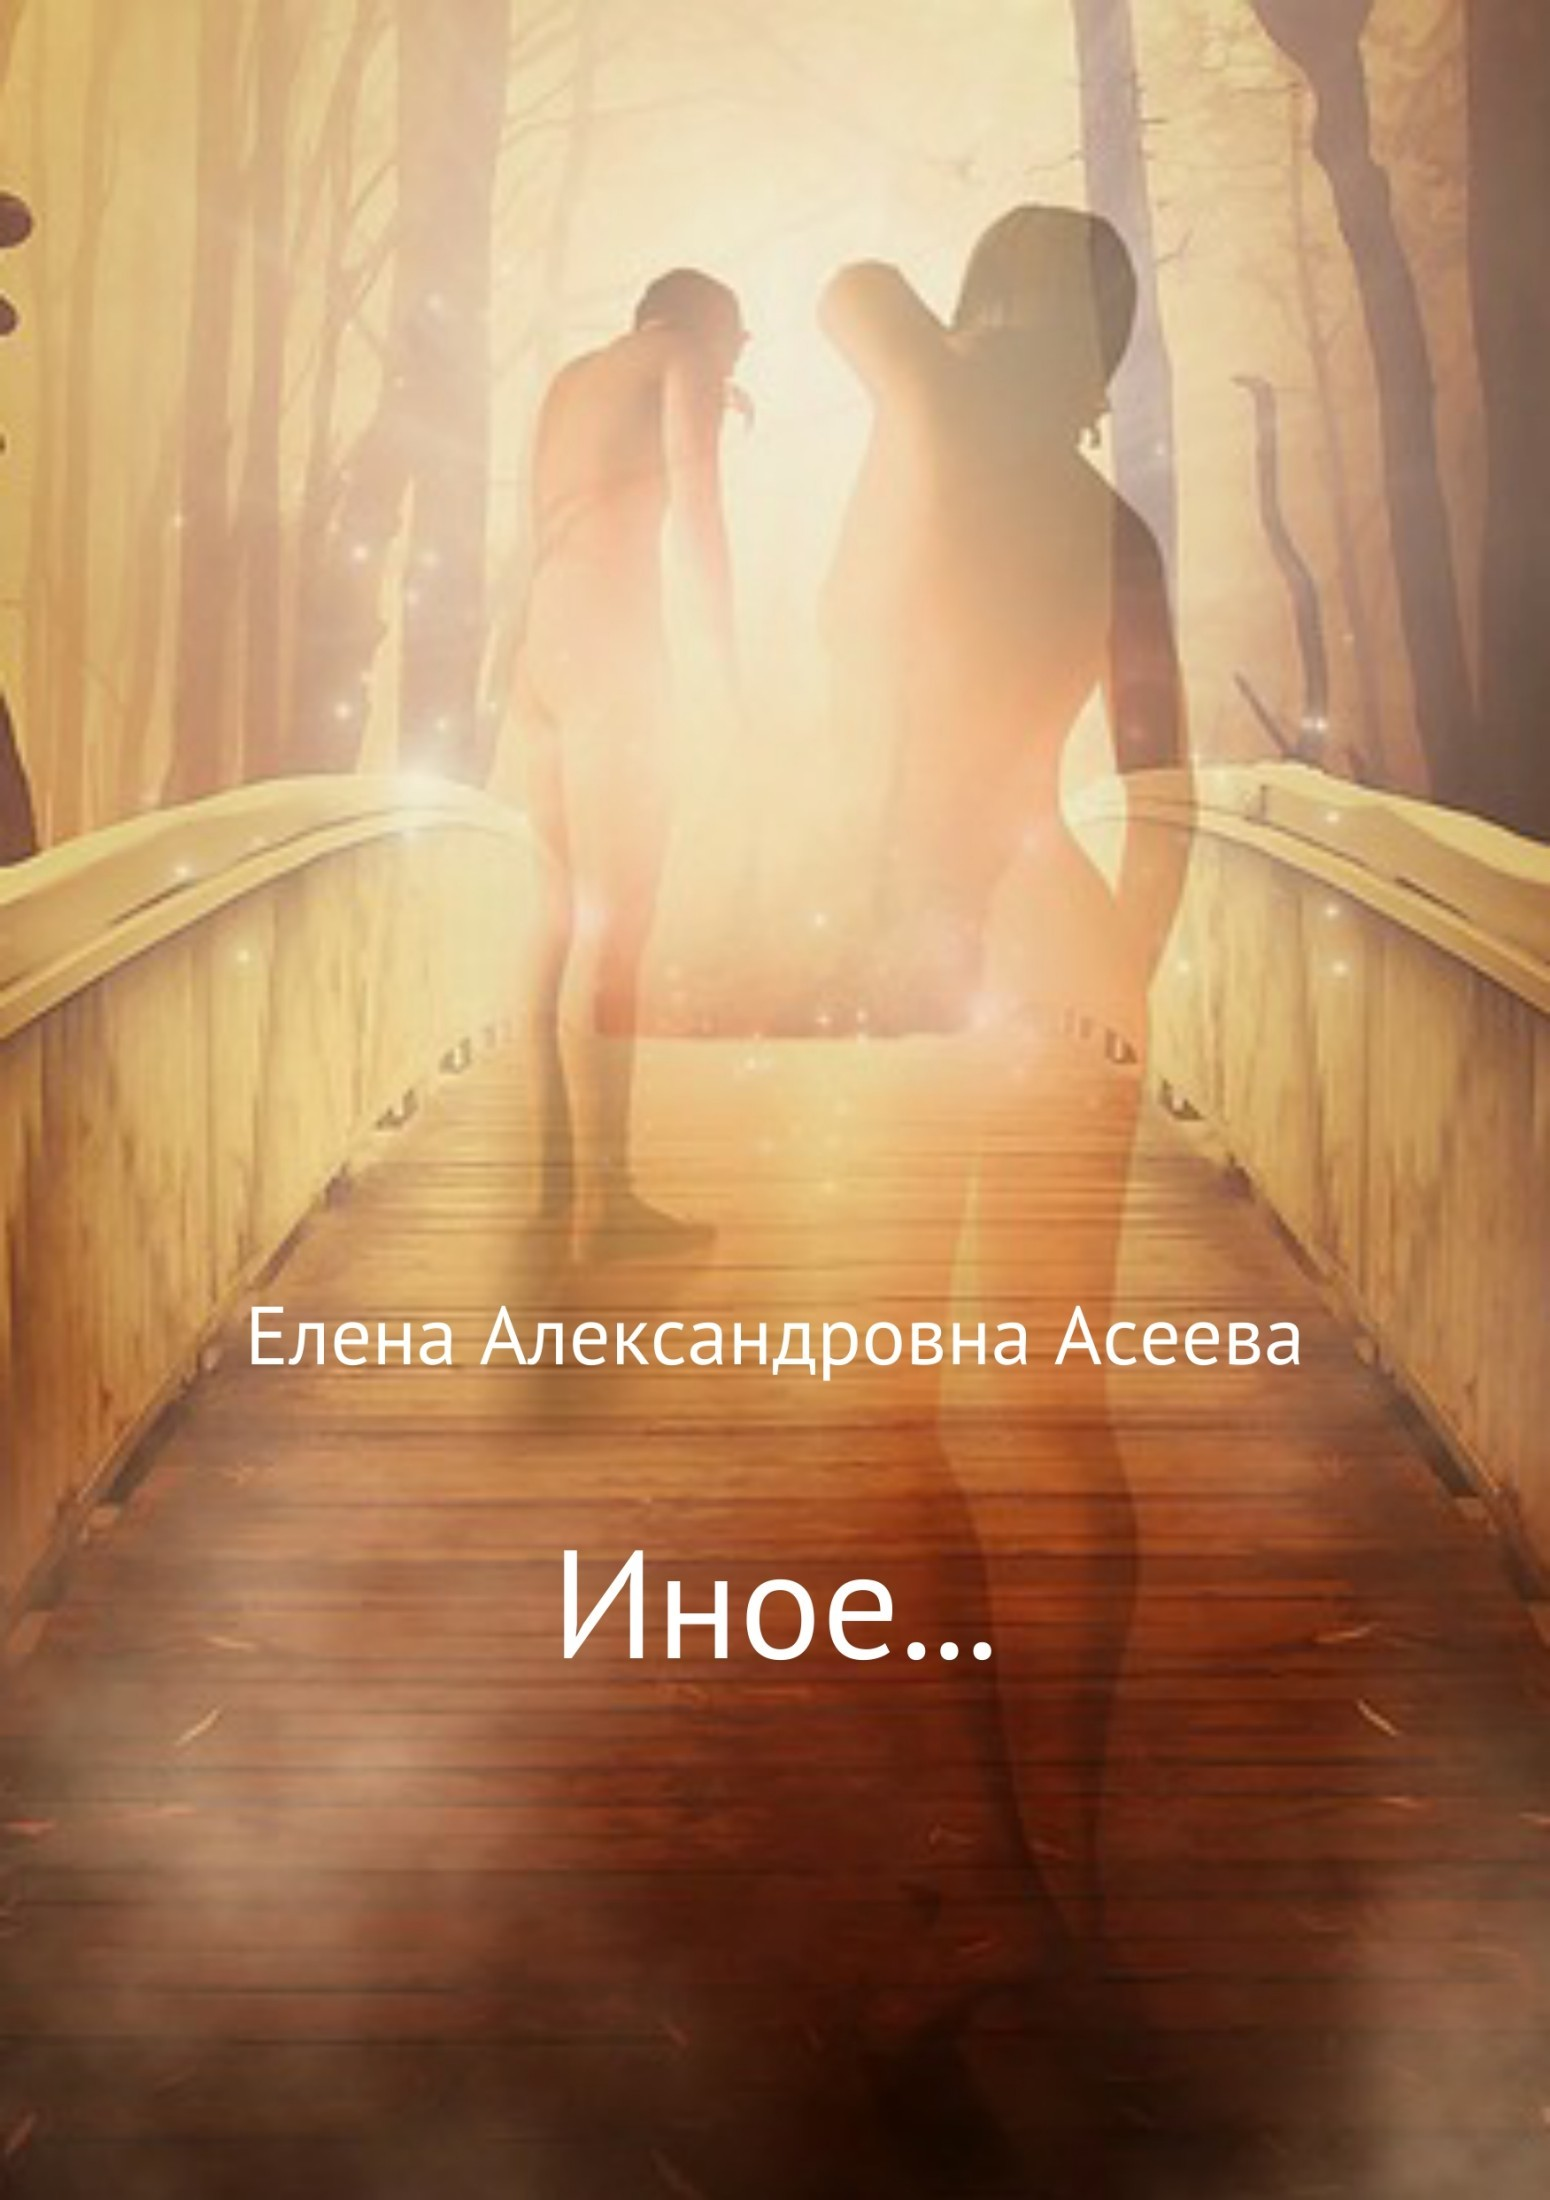 Елена Александровна Асеева Иное… елена александровна козодаева живи танцуя творческая автобиография